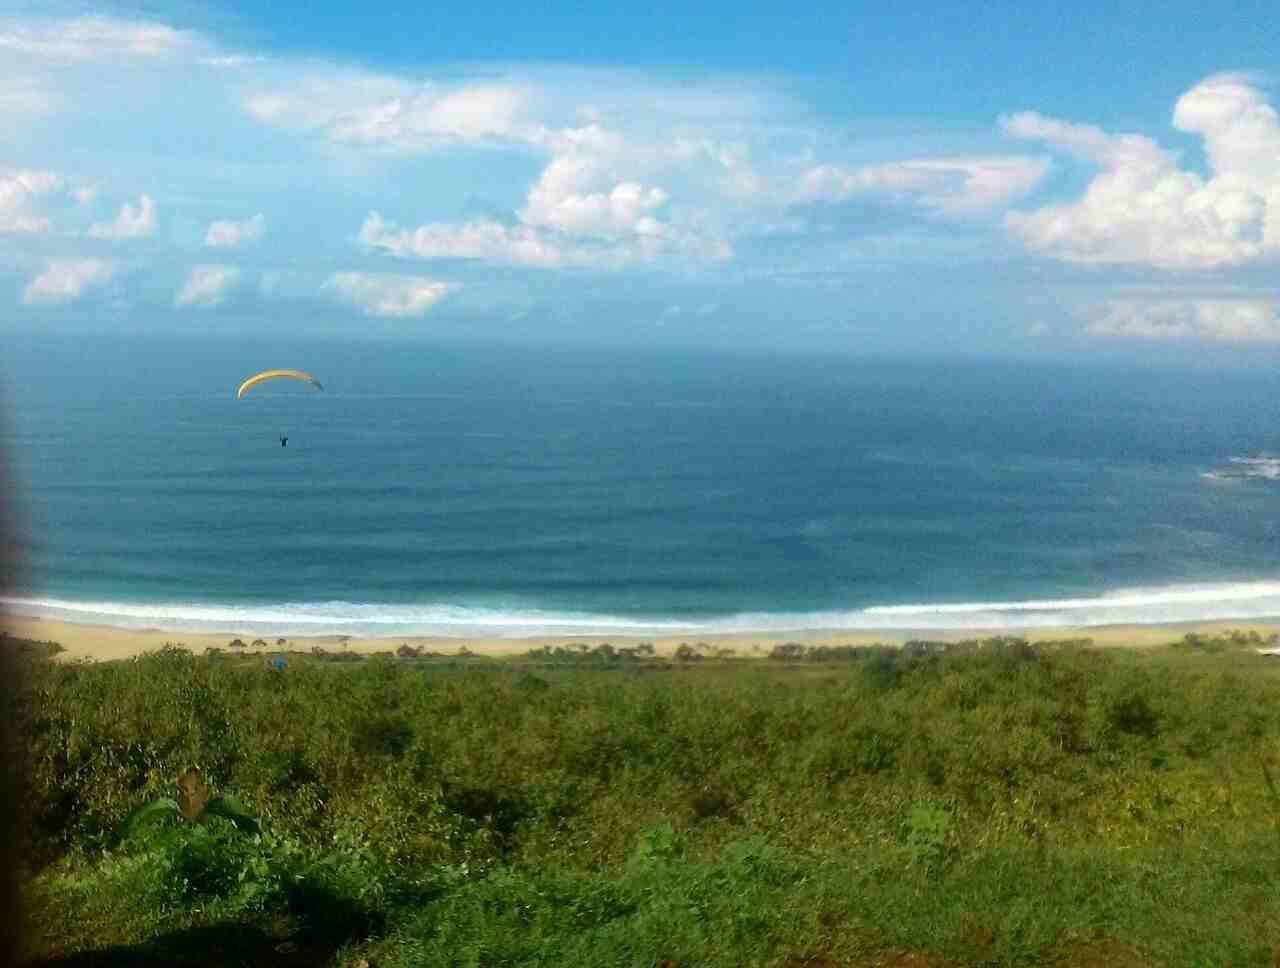 Merasakan Sensasi Paralayang Bukit Waung Pantai Modangan Ist Kab Malang